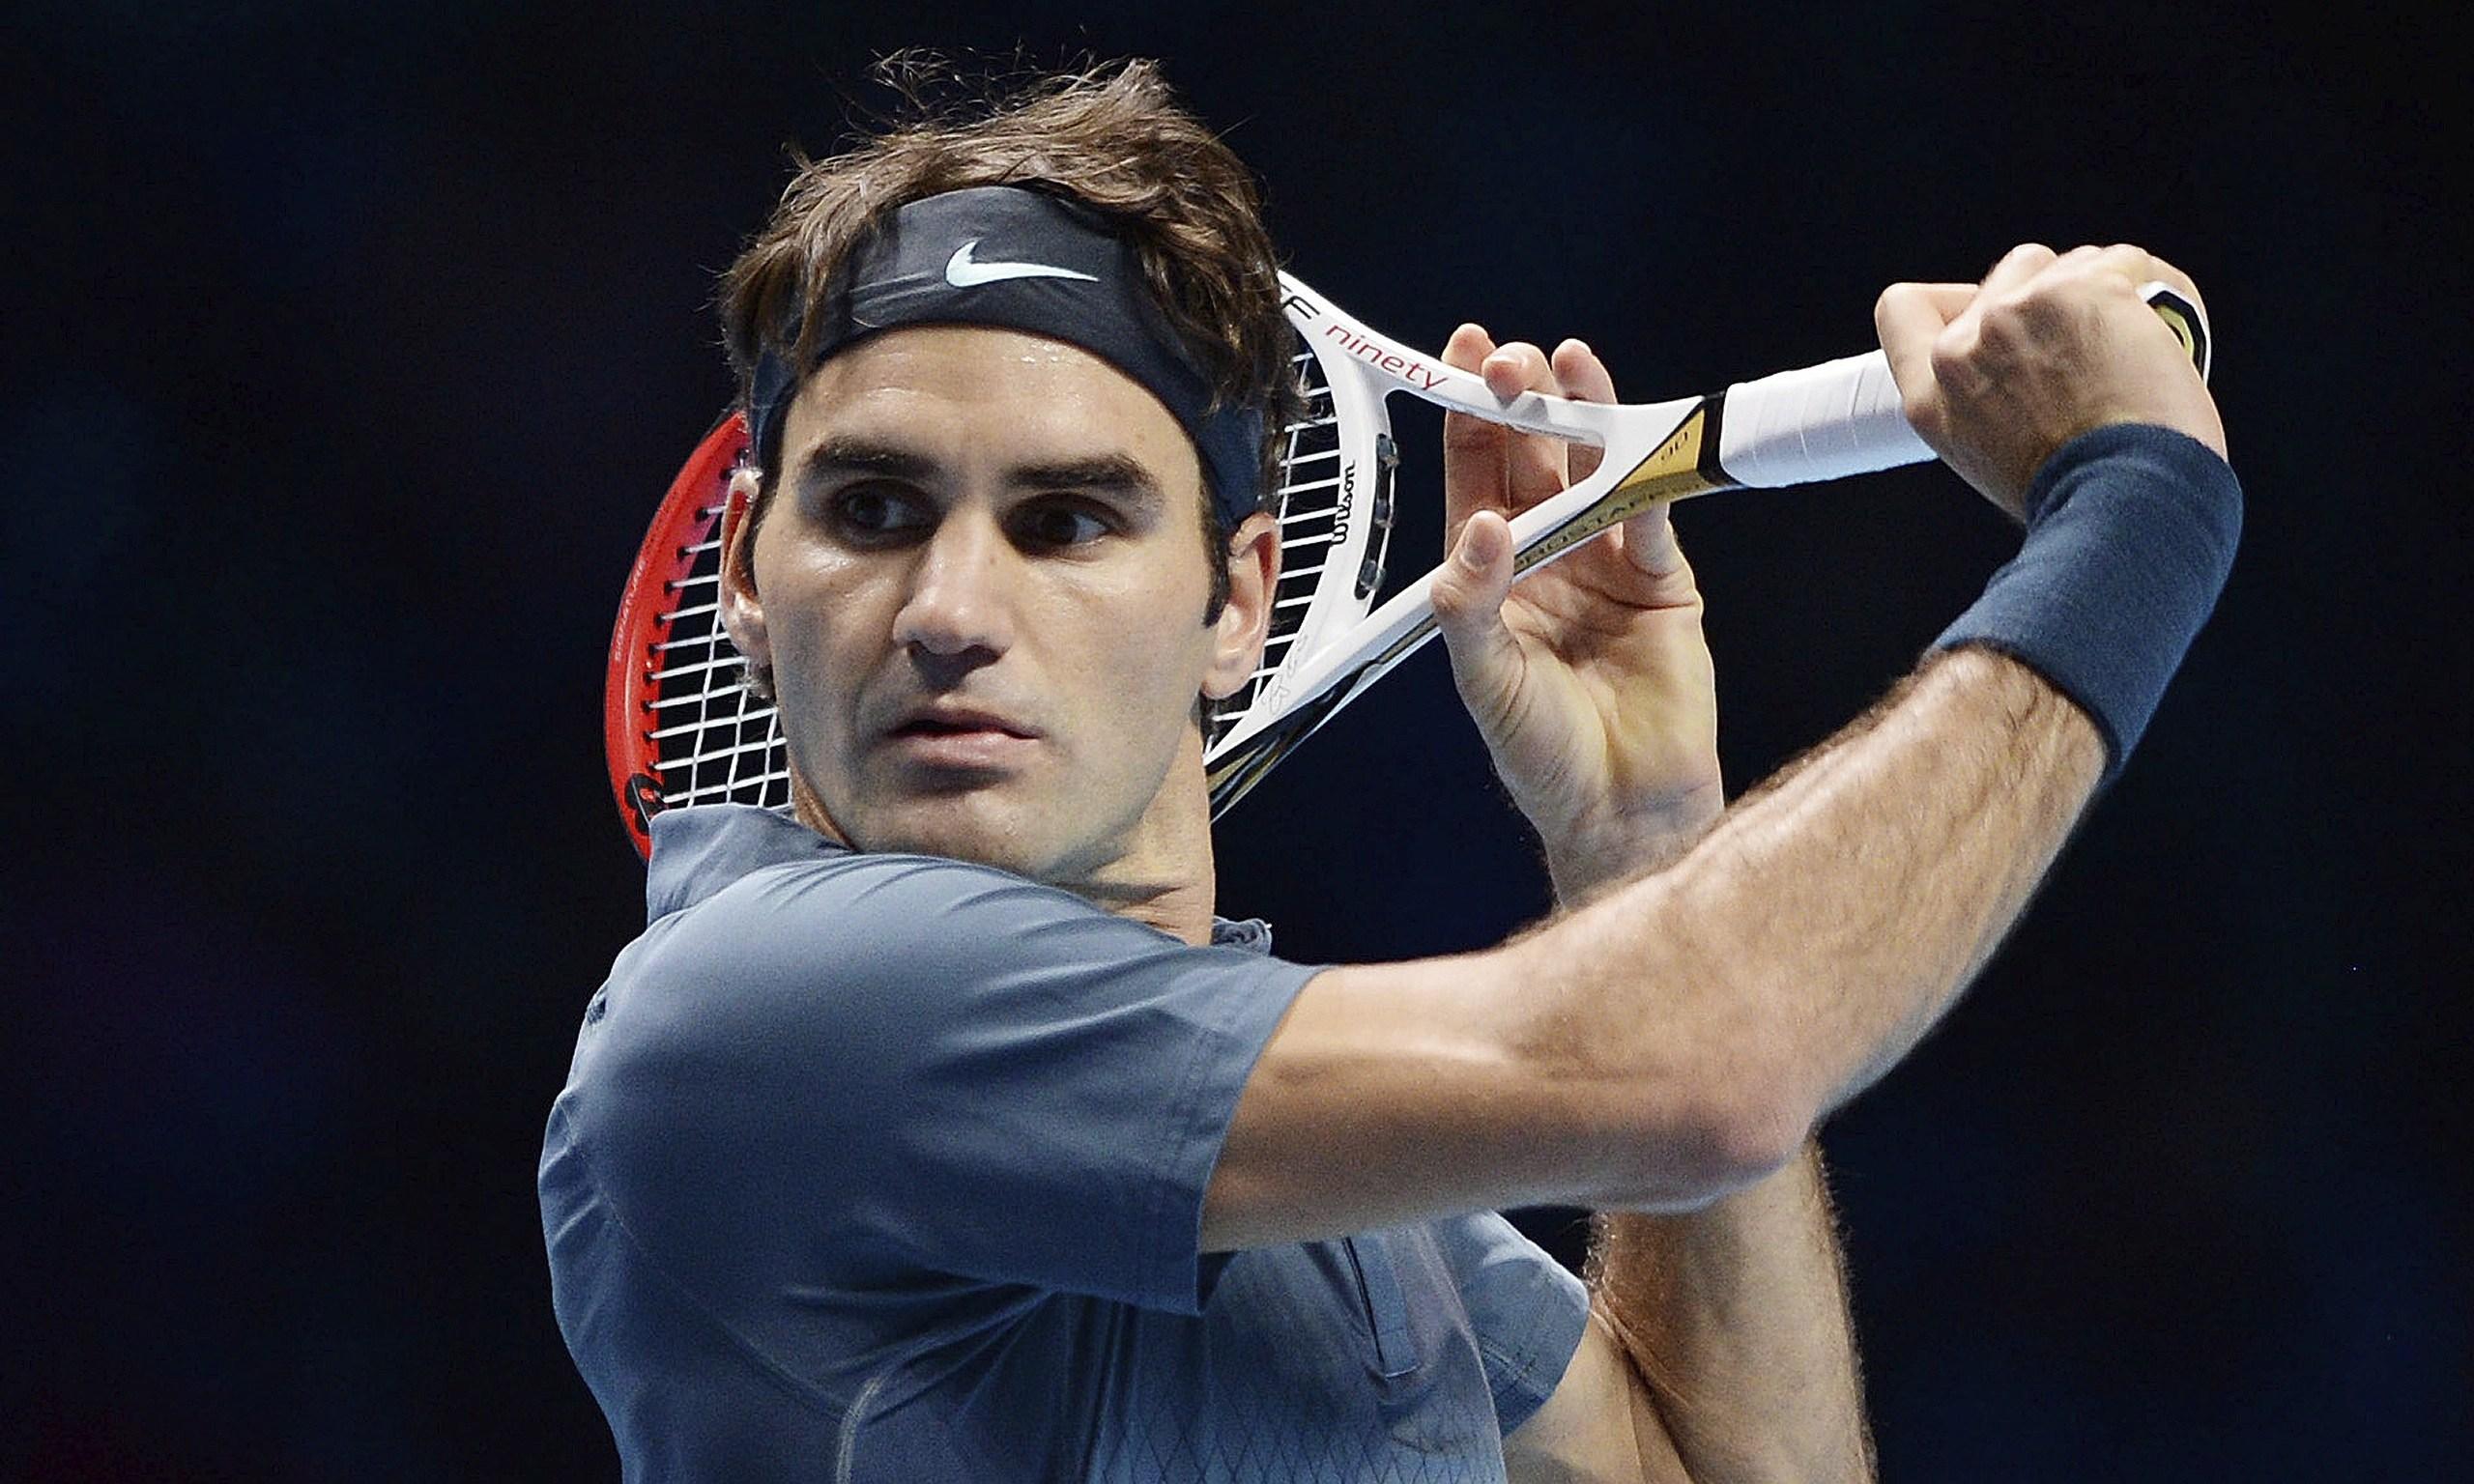 Roger Federer High Quality Wallpapers